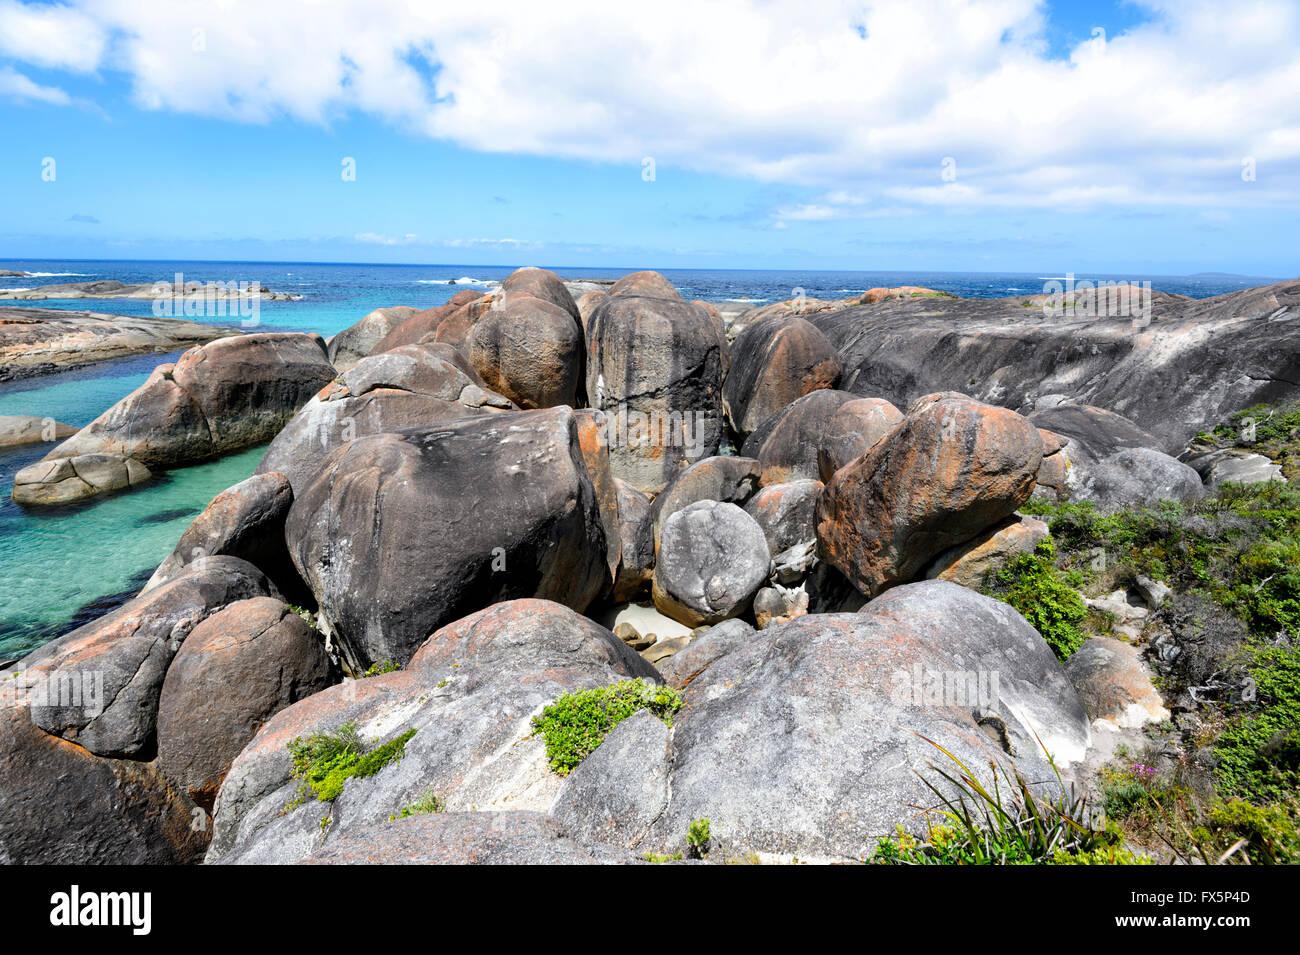 Elephant Cove, au Danemark, en Australie occidentale, Australie Photo Stock